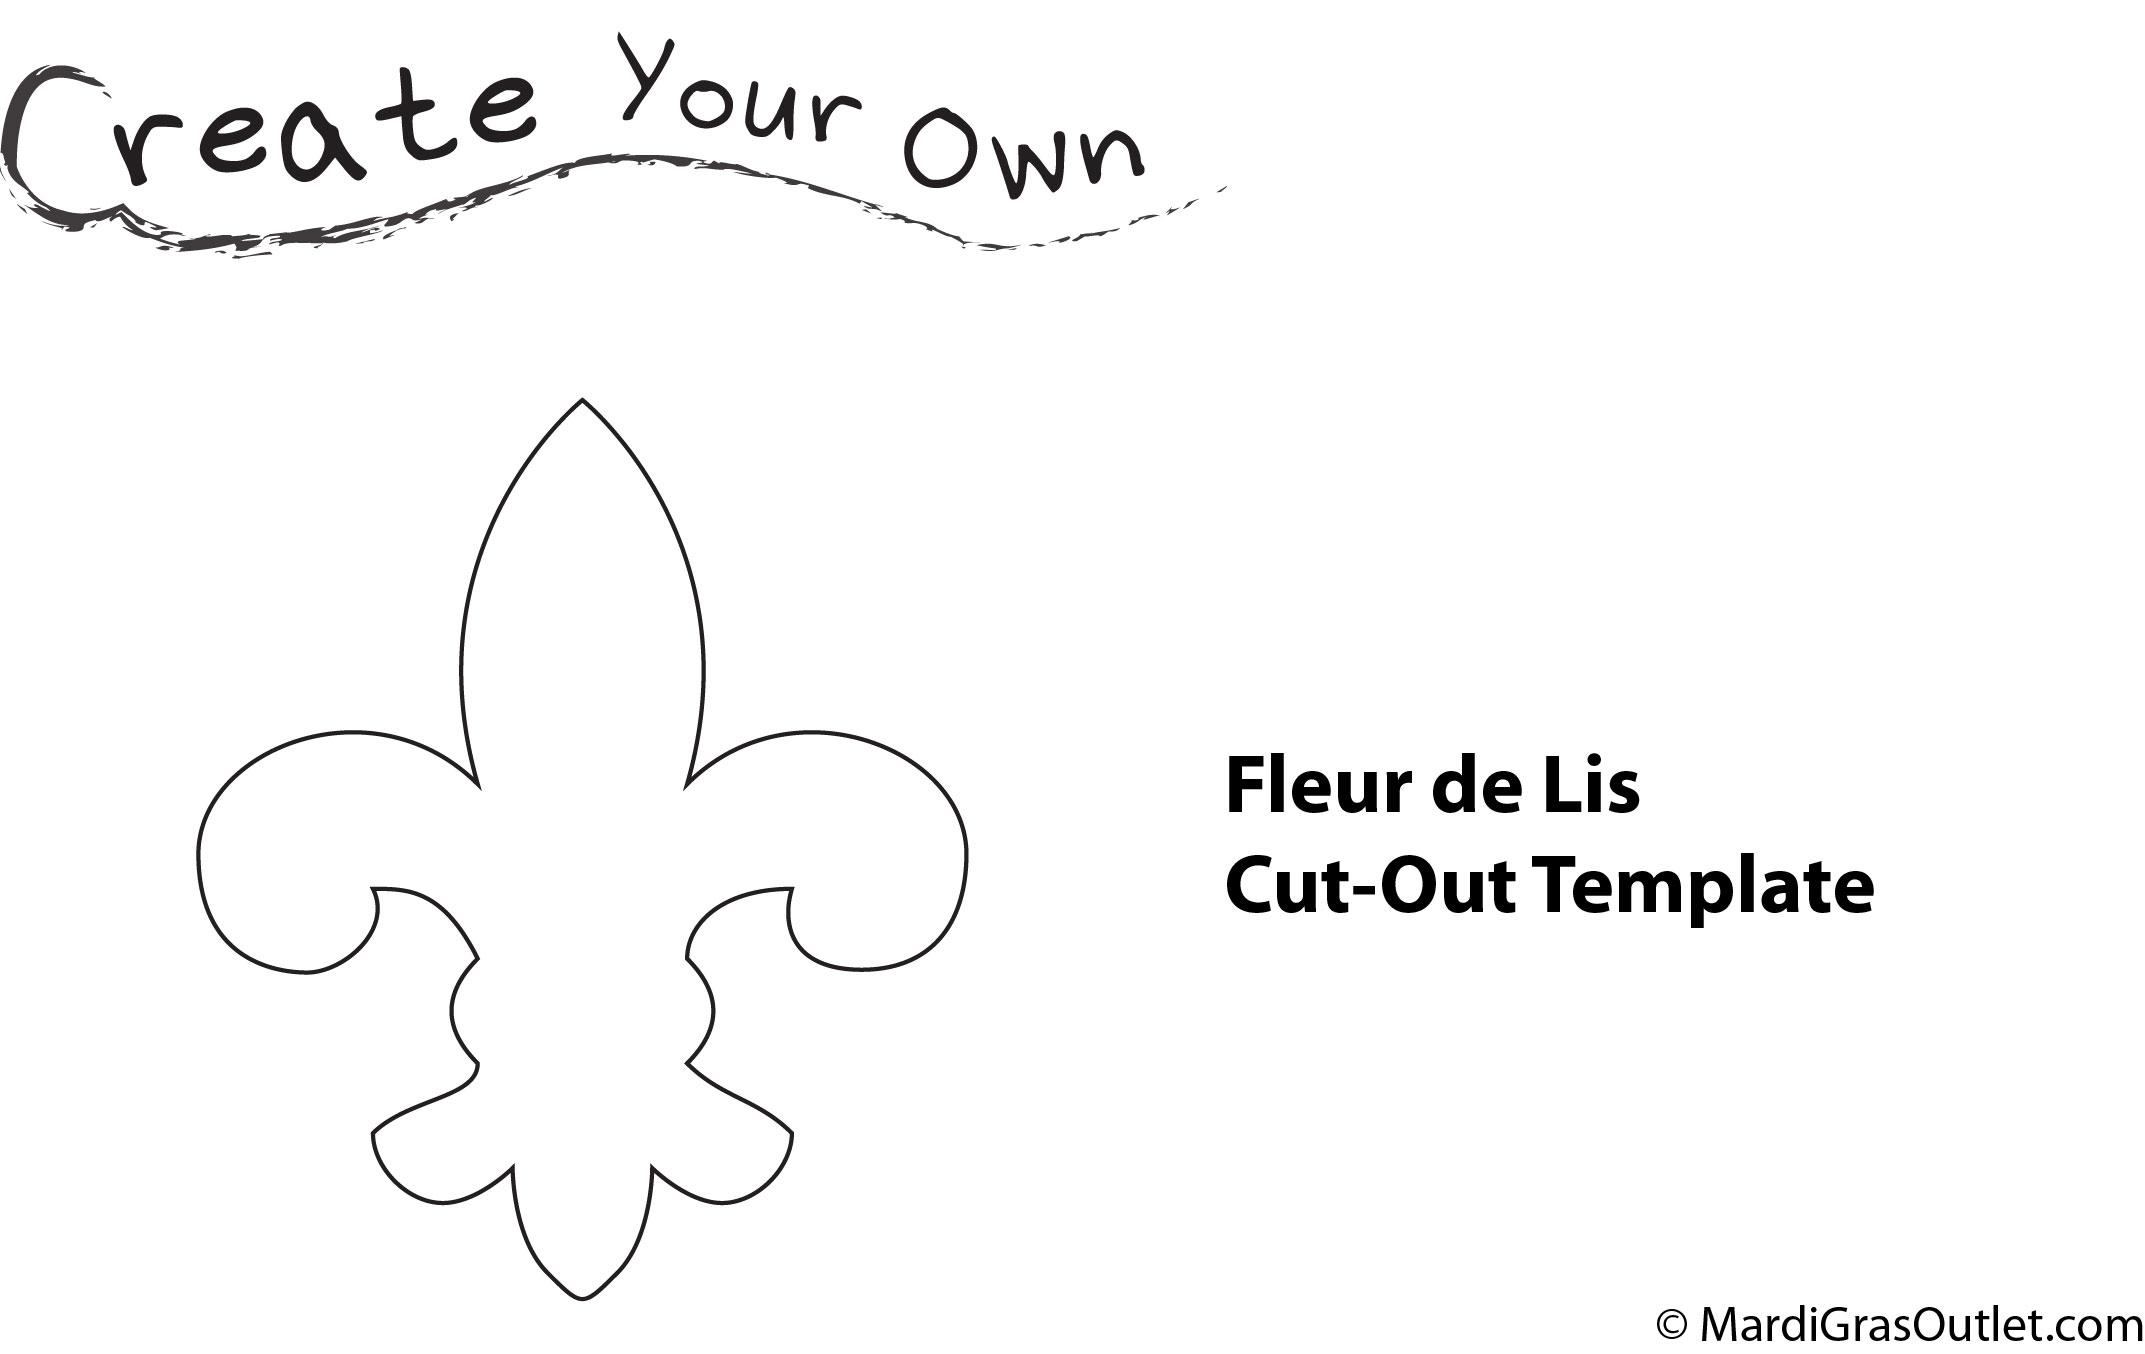 party ideas by mardi gras outlet  how to  fleur de lis silhouette gift wrap